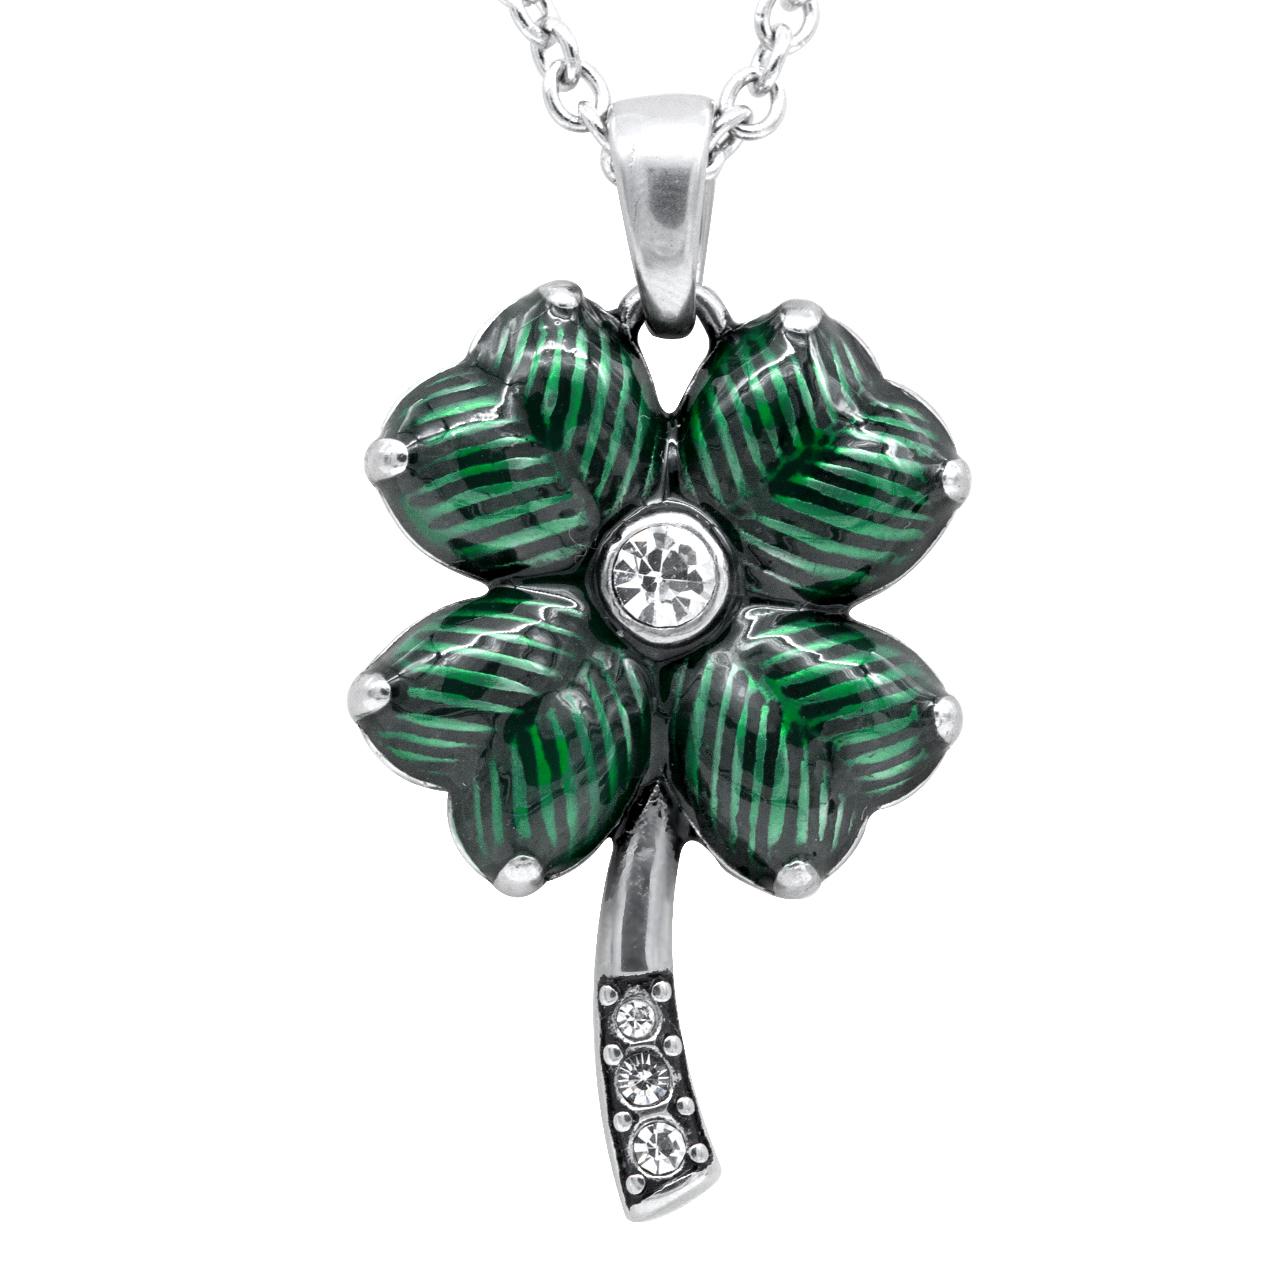 Four Leaf Clover with Swarovski Crystals Necklace